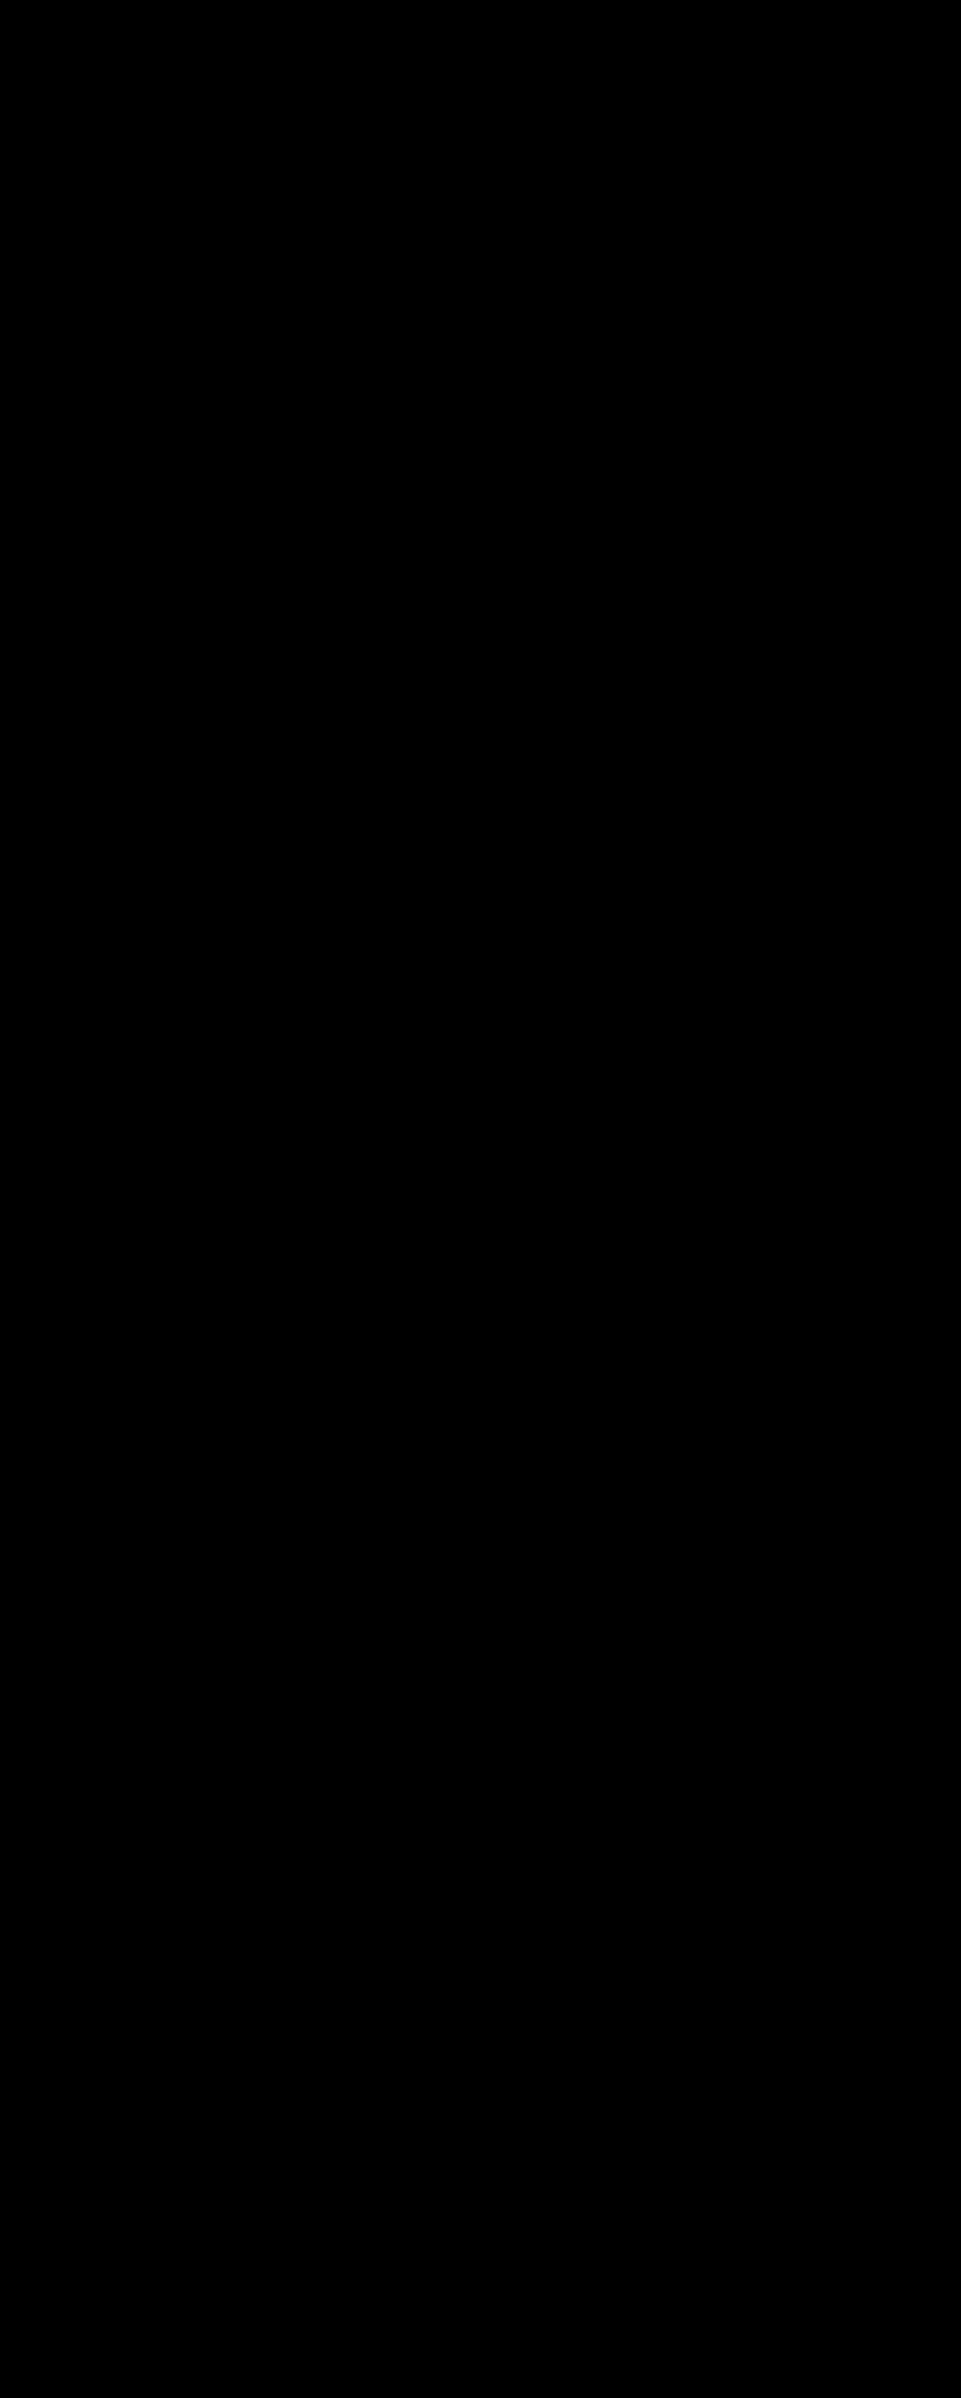 Clipart guitar gray. Big image png